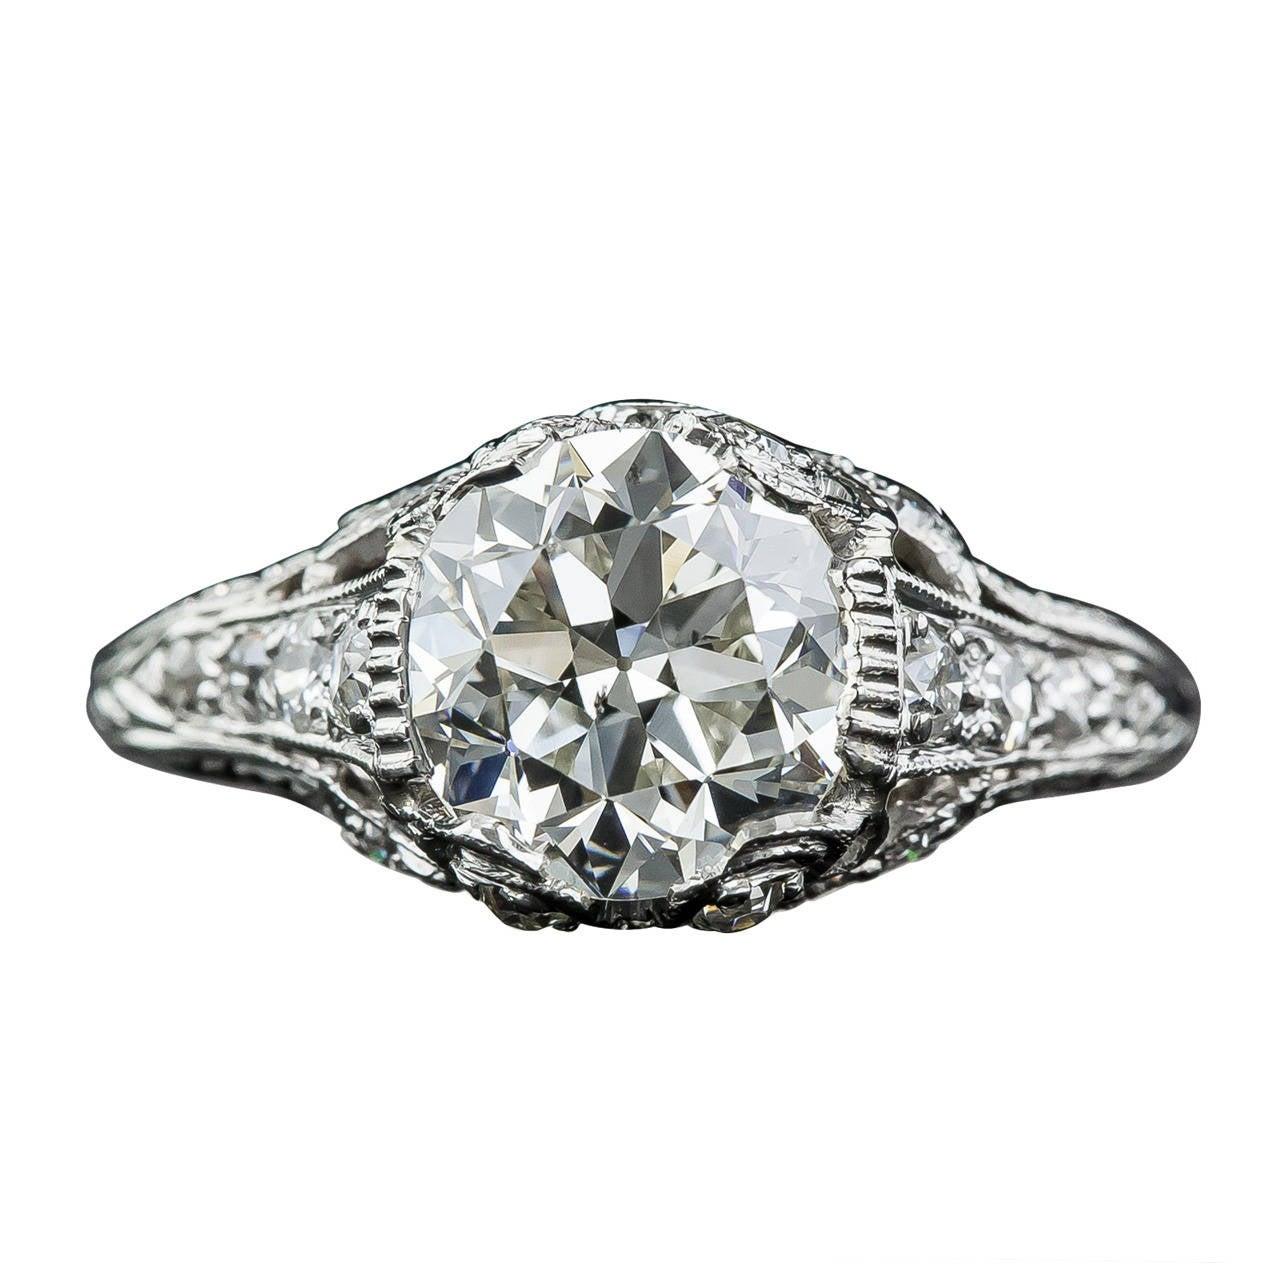 Edwardian GIA Cert 2.09 Carat Diamond Platinum Ring For Sale